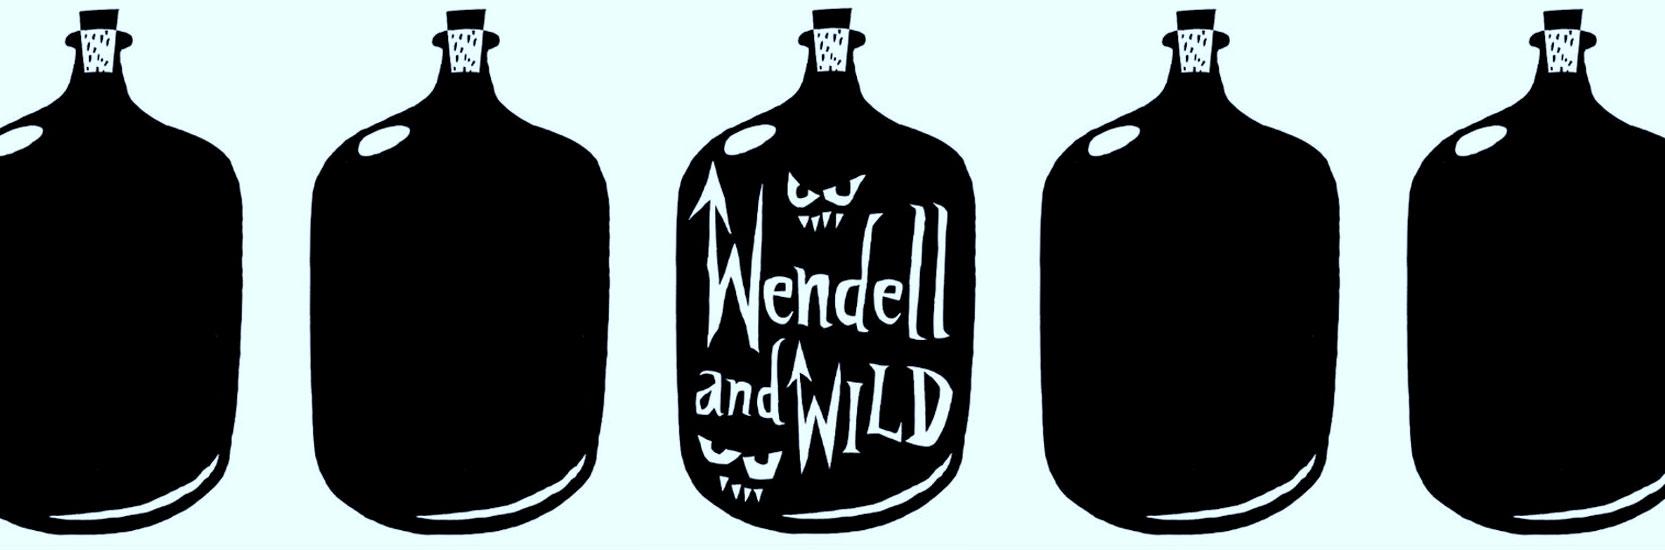 "Annecy 2020 – Ce qu'on a appris sur ""Wendell & Wild"", le film d'Henry Selick"